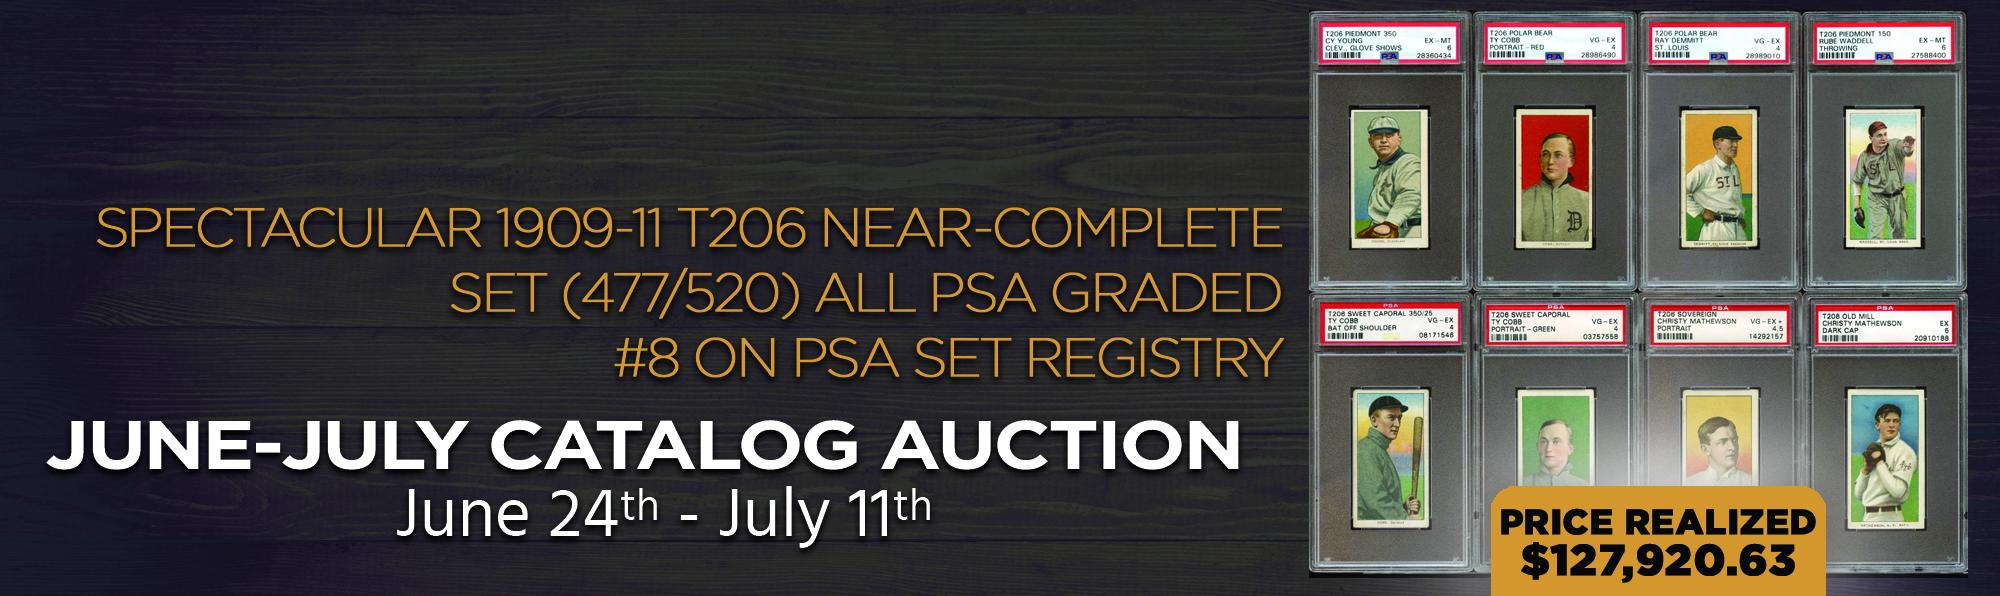 Spectacular 1909-11 T206 Near-Complete Set (477/520) All PSA Graded #8 on PSA Set Registry